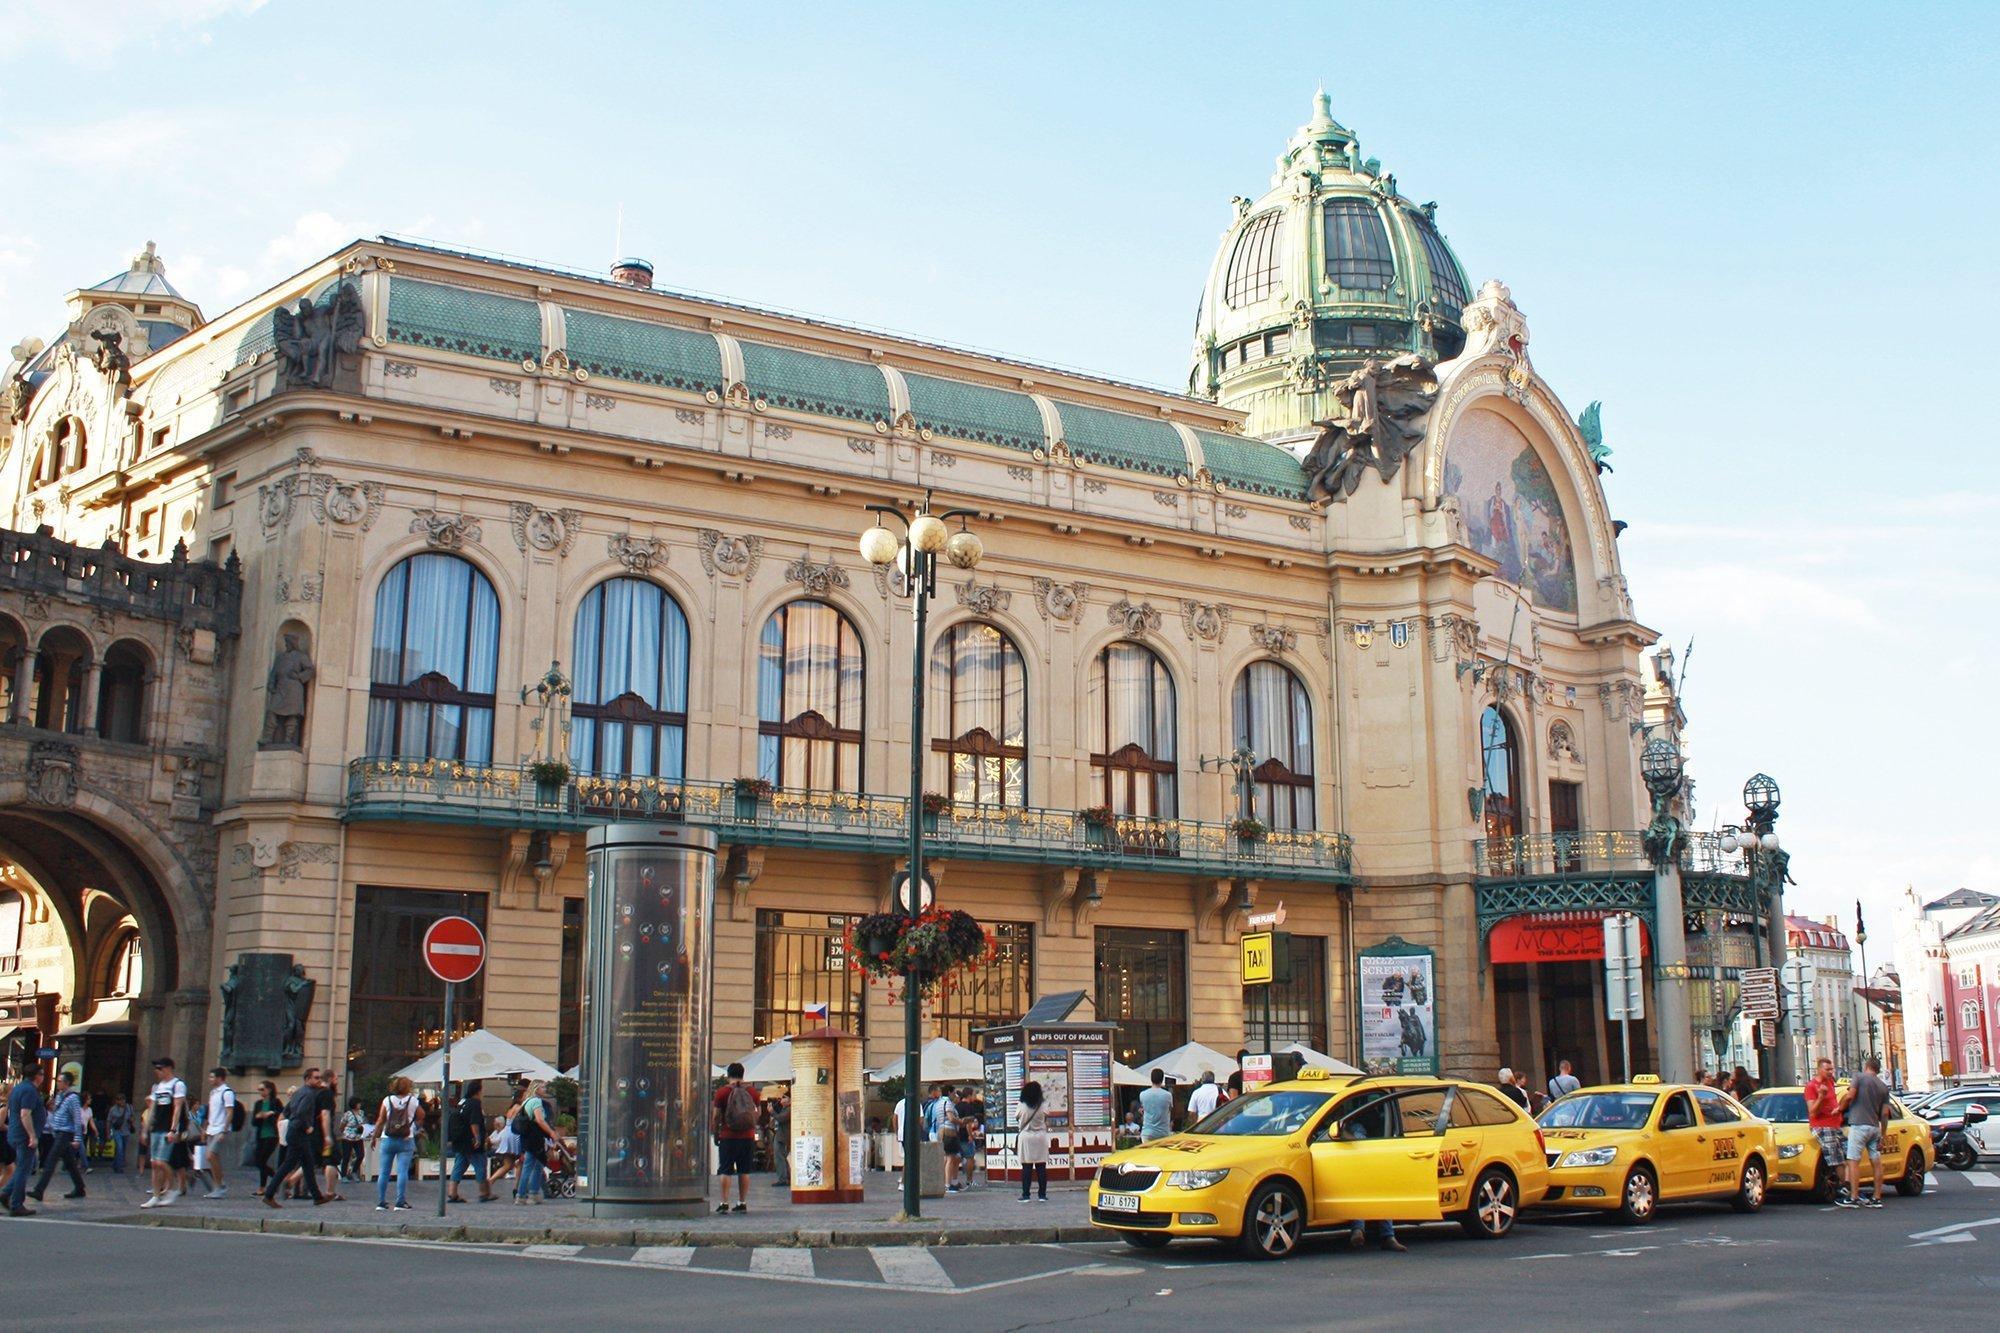 Obecni Dum Municipal House, Prague